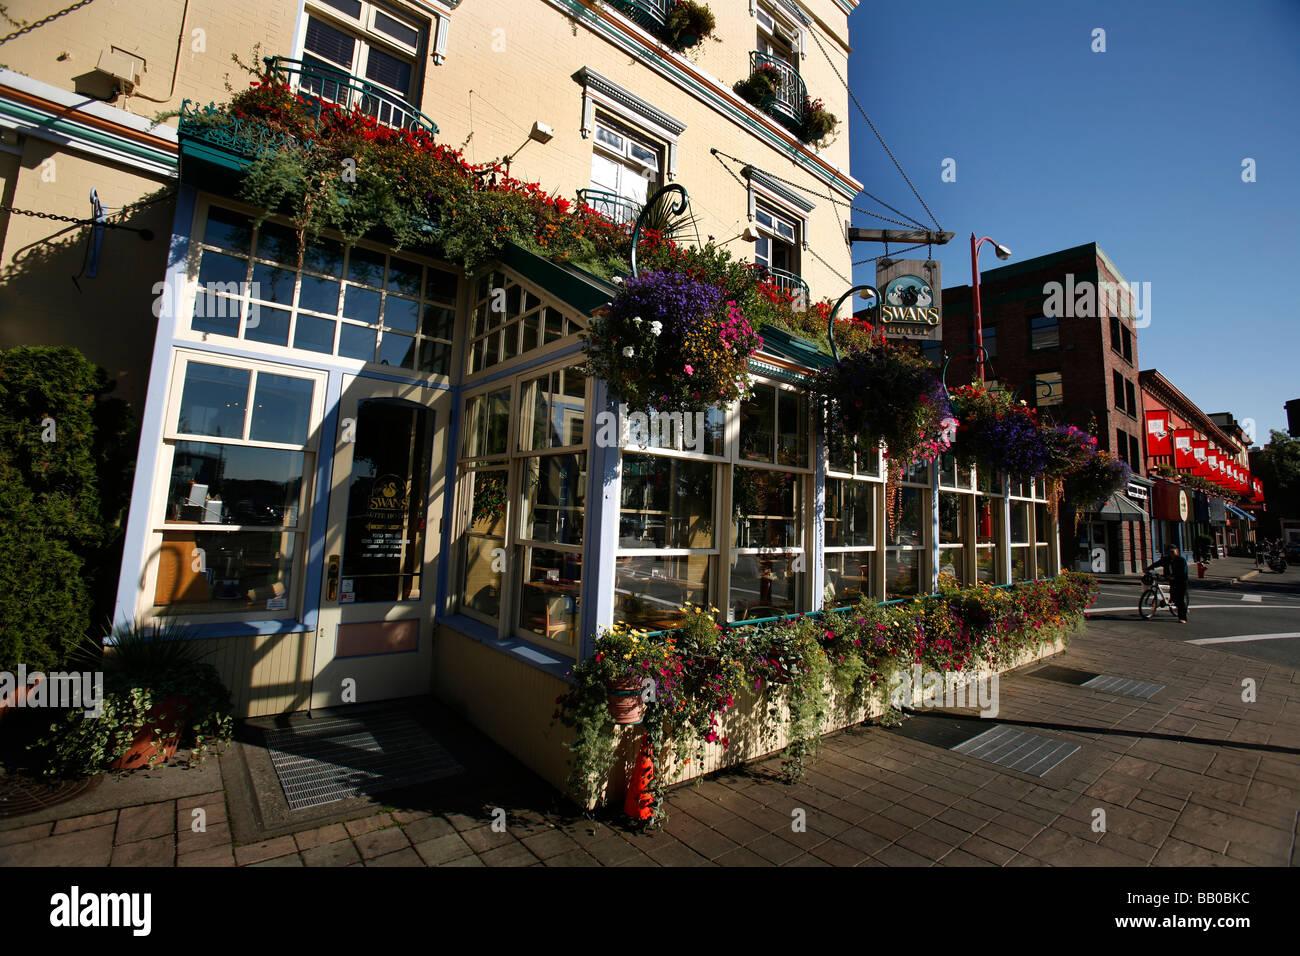 Swans Boutique Art Hotel Pub Restaurant Bistro And